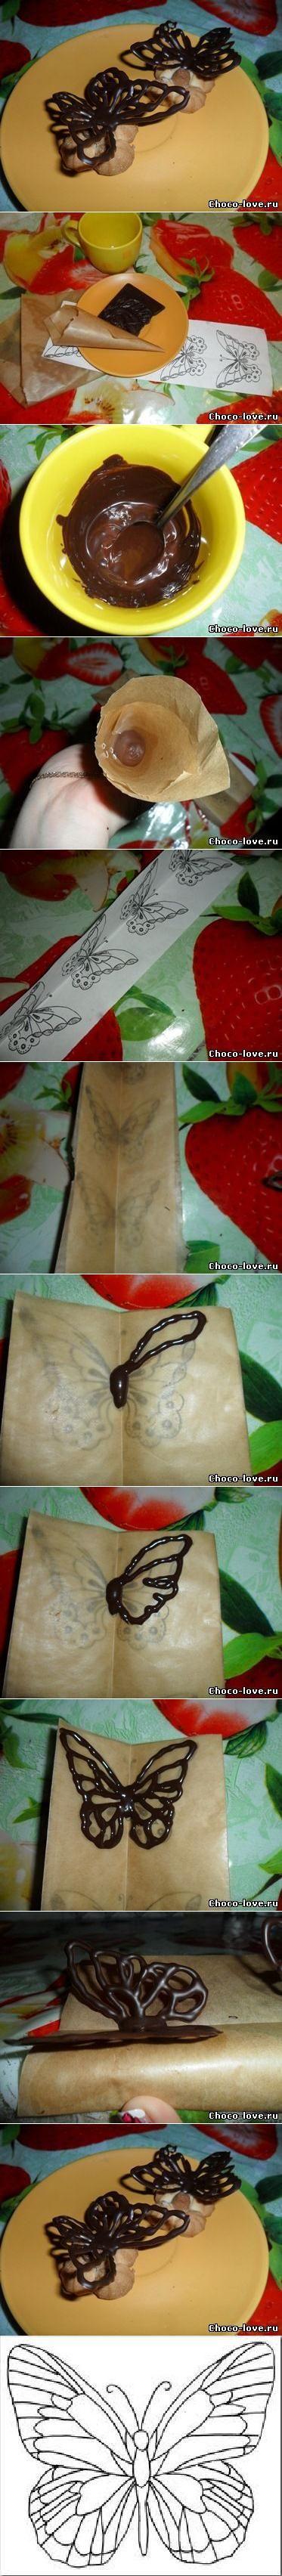 DIY Chocolate Butterfly Decoration | FabDIY